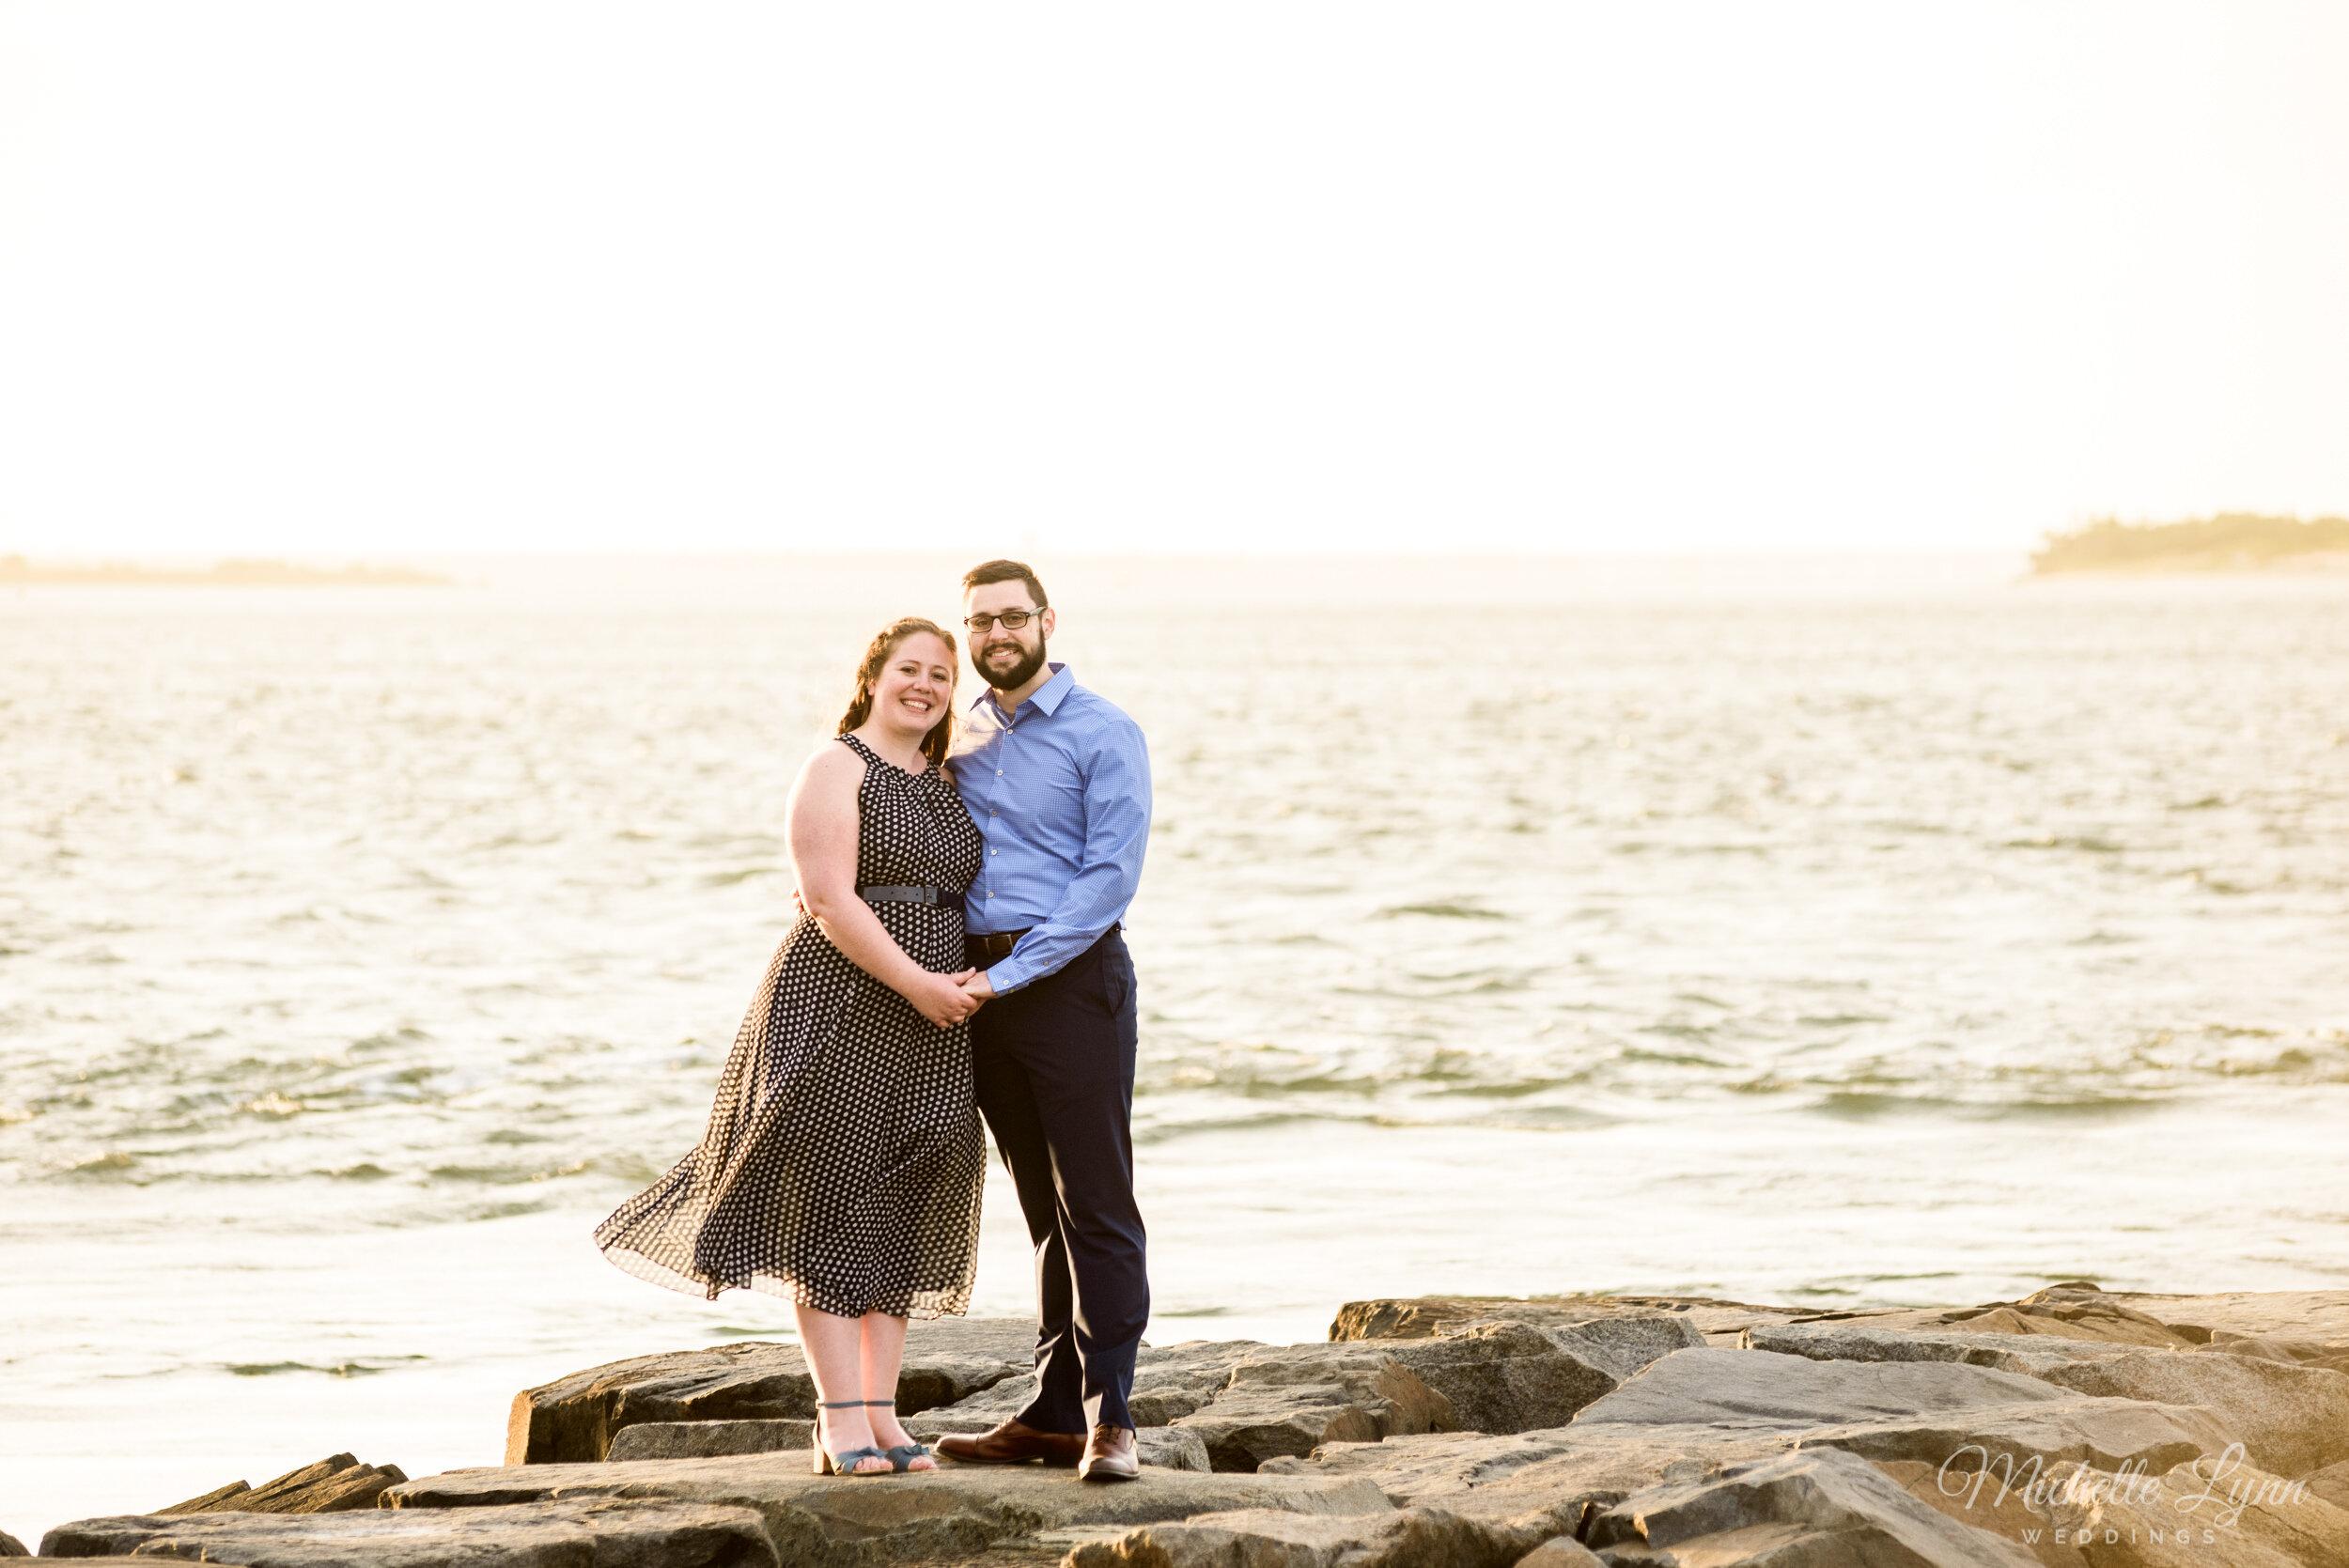 barnegat-lighthouse-engagement-photos-michelle-lynn-weddings-21.jpg